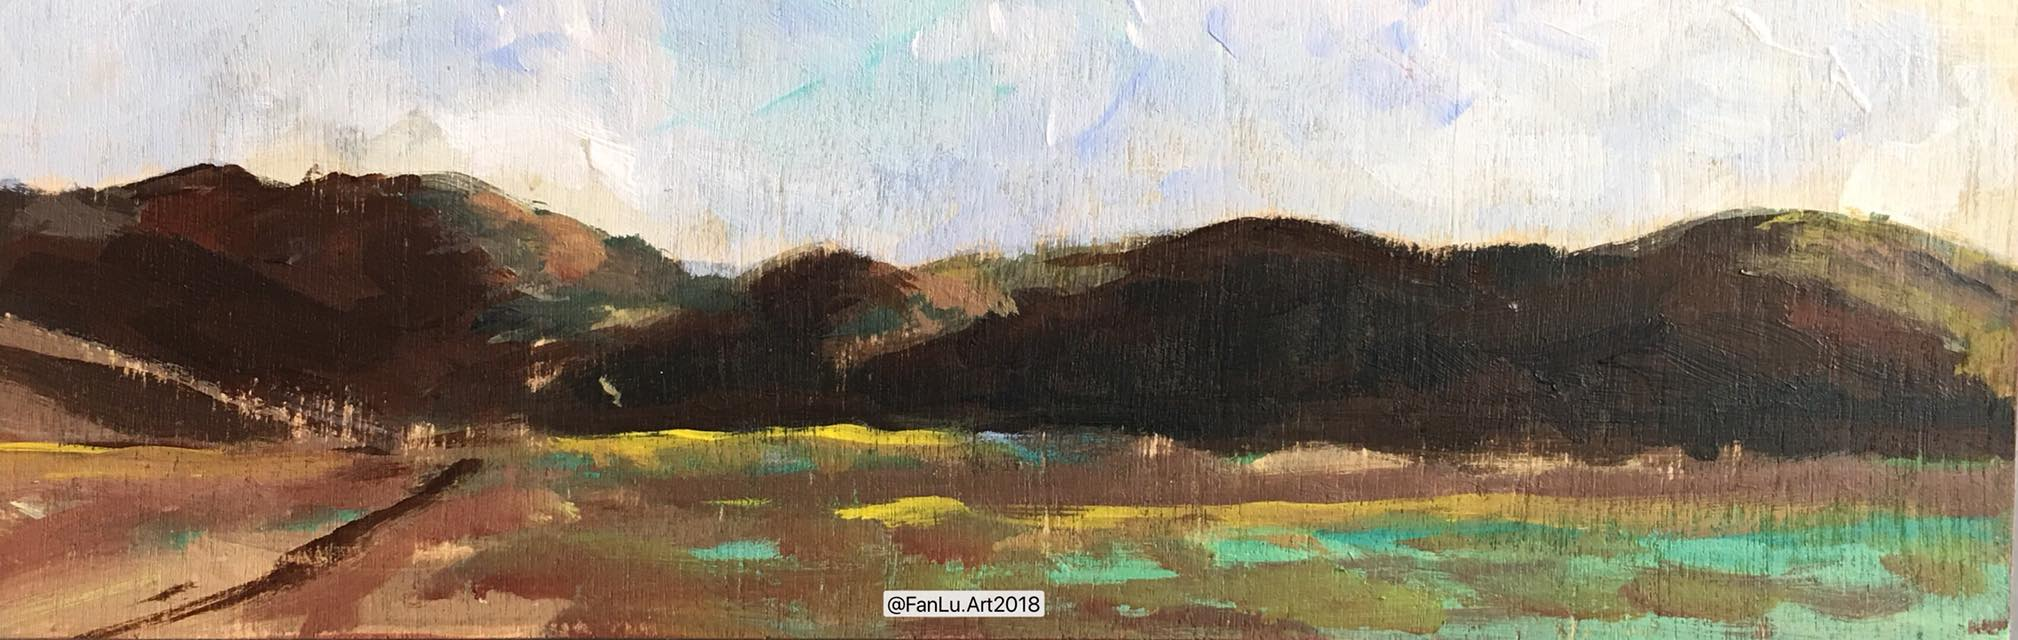 Artwork title: Sausalito field trip #1 Artist: Fan Lu ( Acrylic on wood, 3x9  inch)